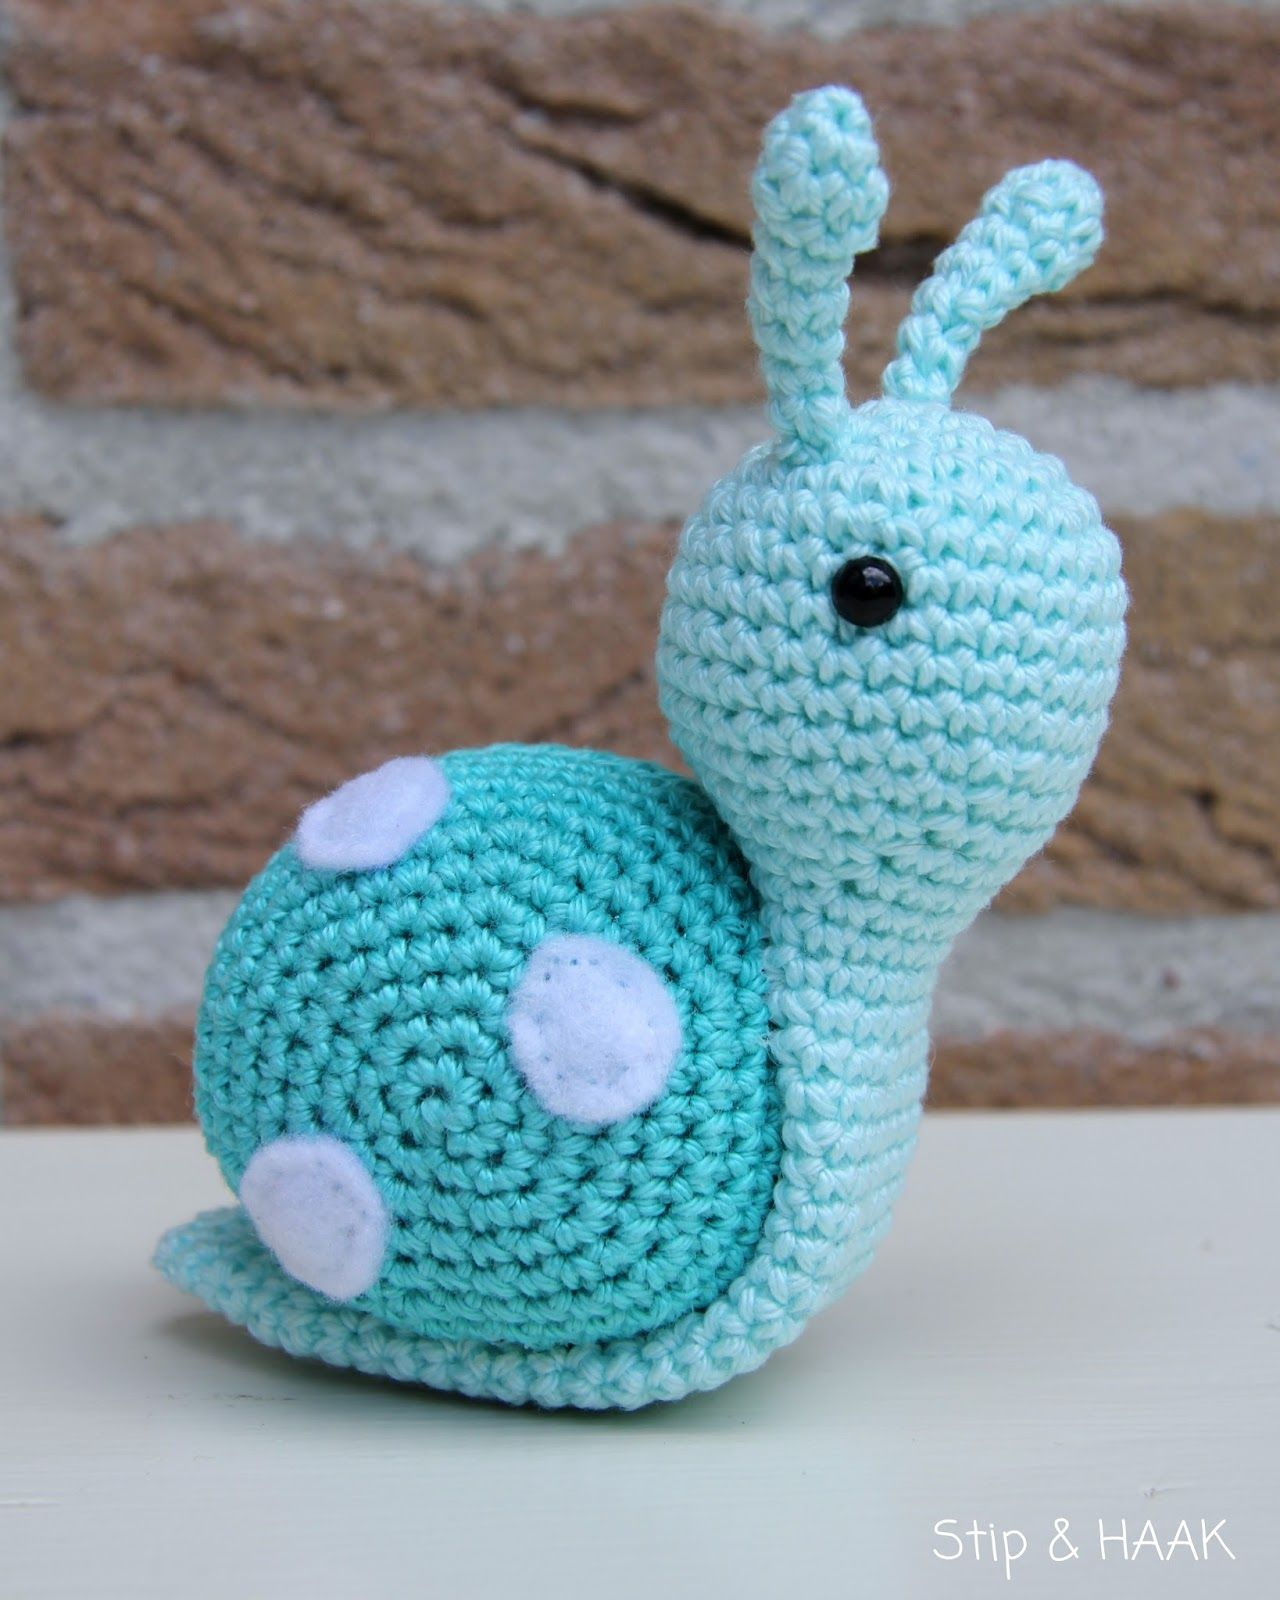 hight resolution of crochet snail free pattern